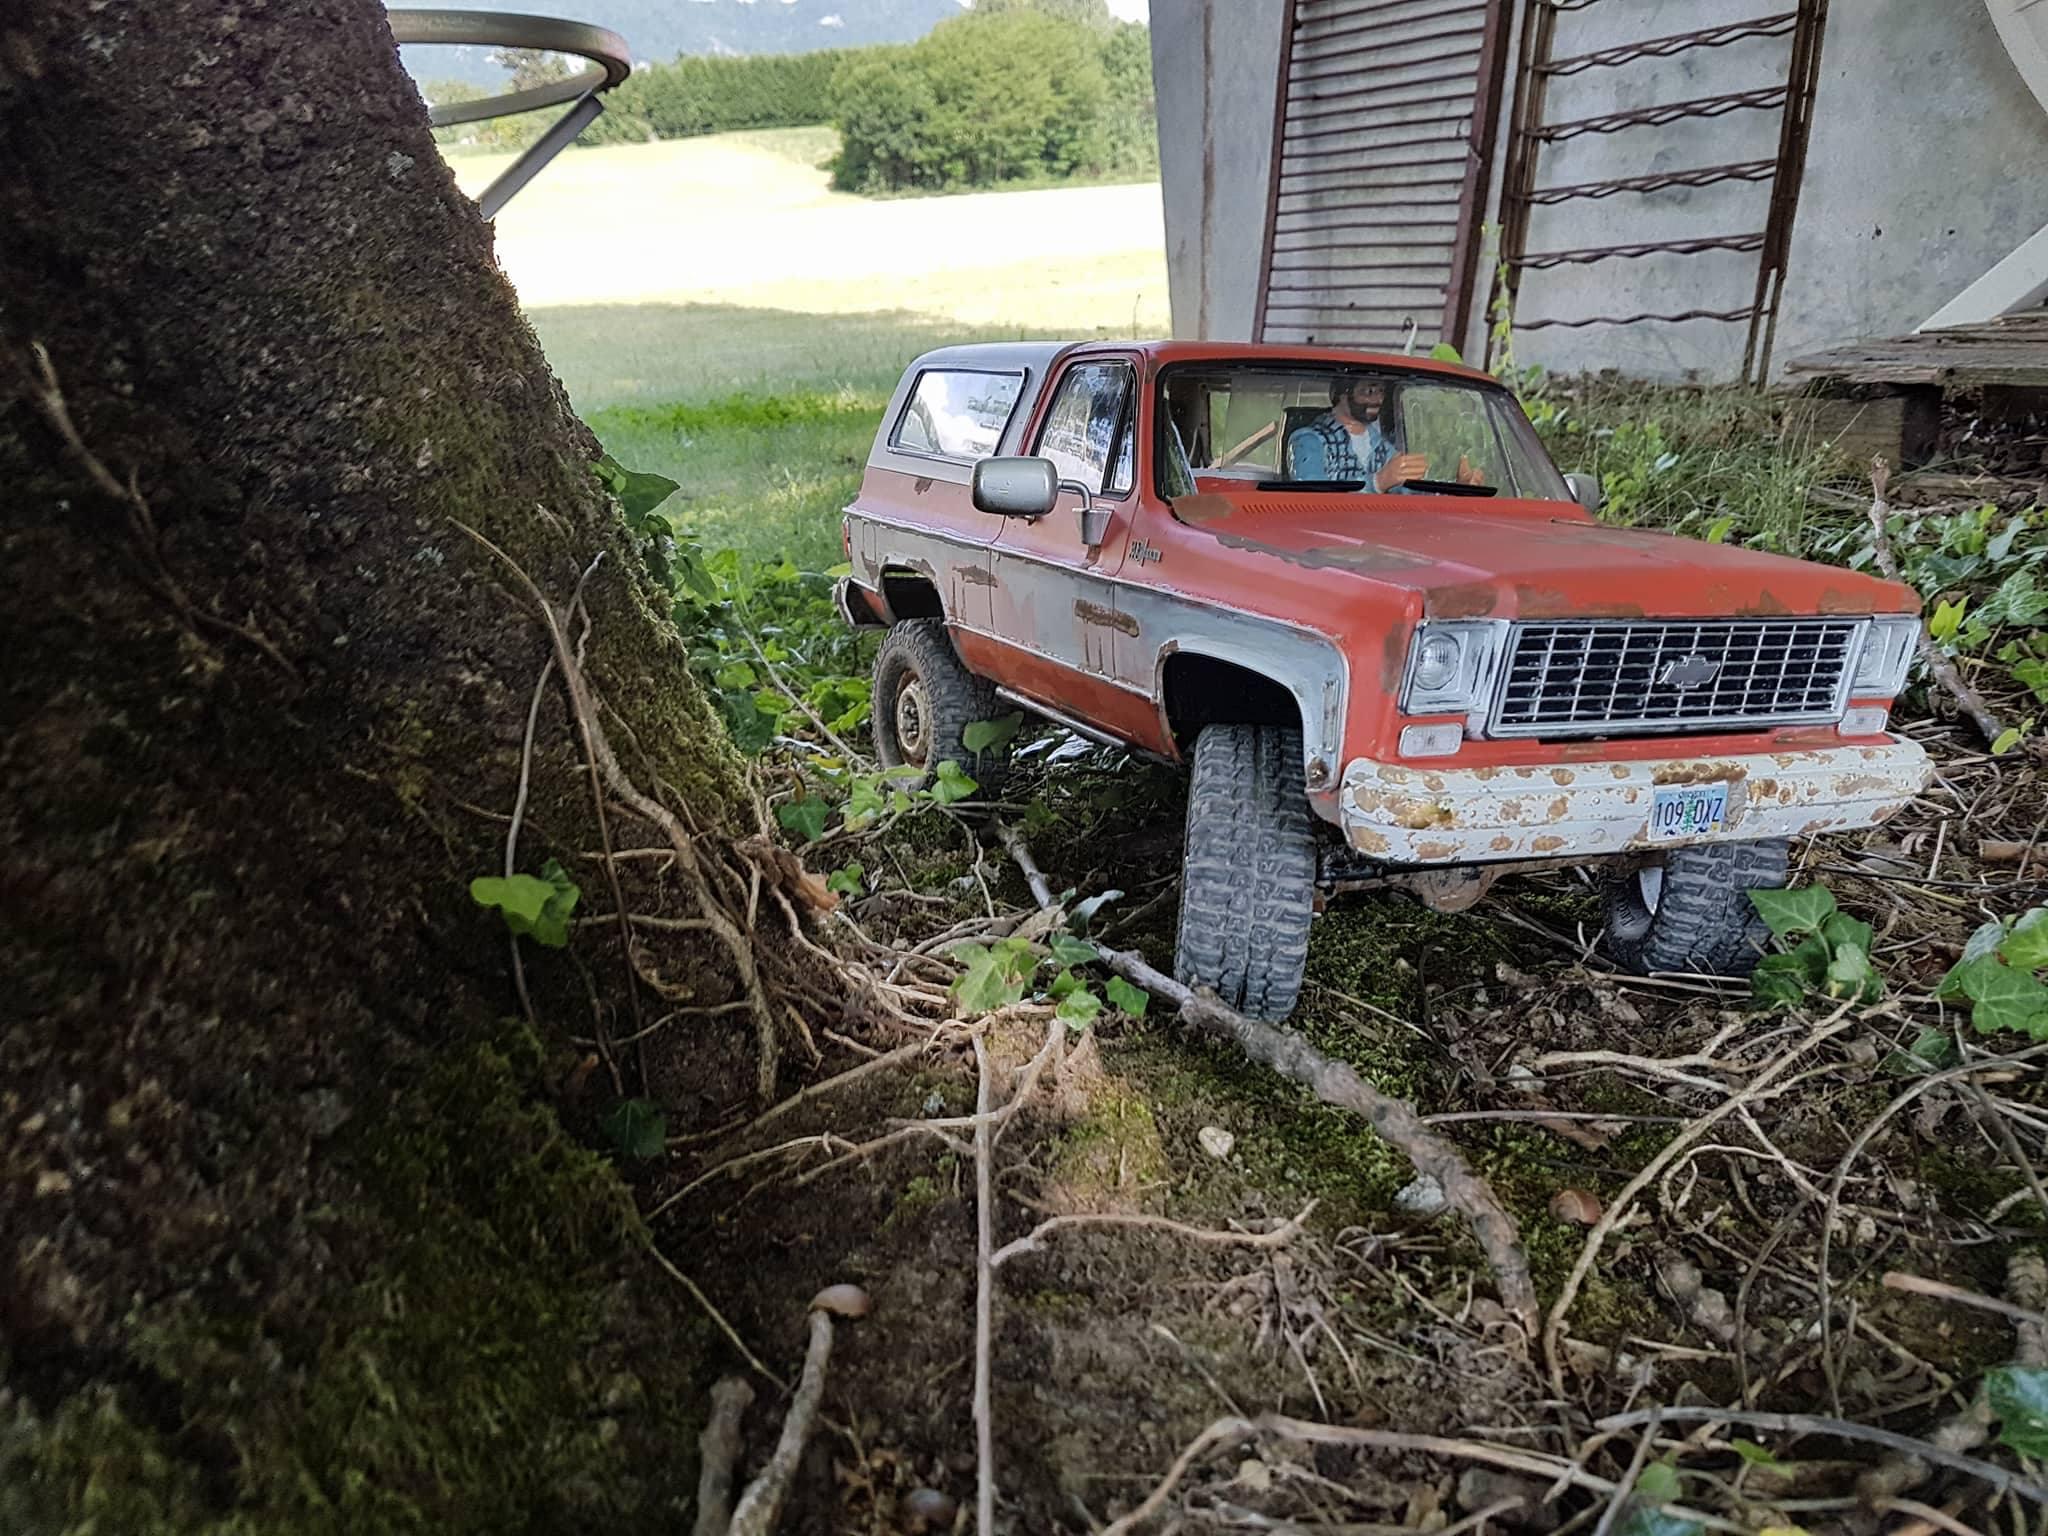 Farm Truck Chevrolet Blazer K5 sur TF2, Road Trip ! - Page 2 1496170546-18818334-1284018941716646-573226960-o